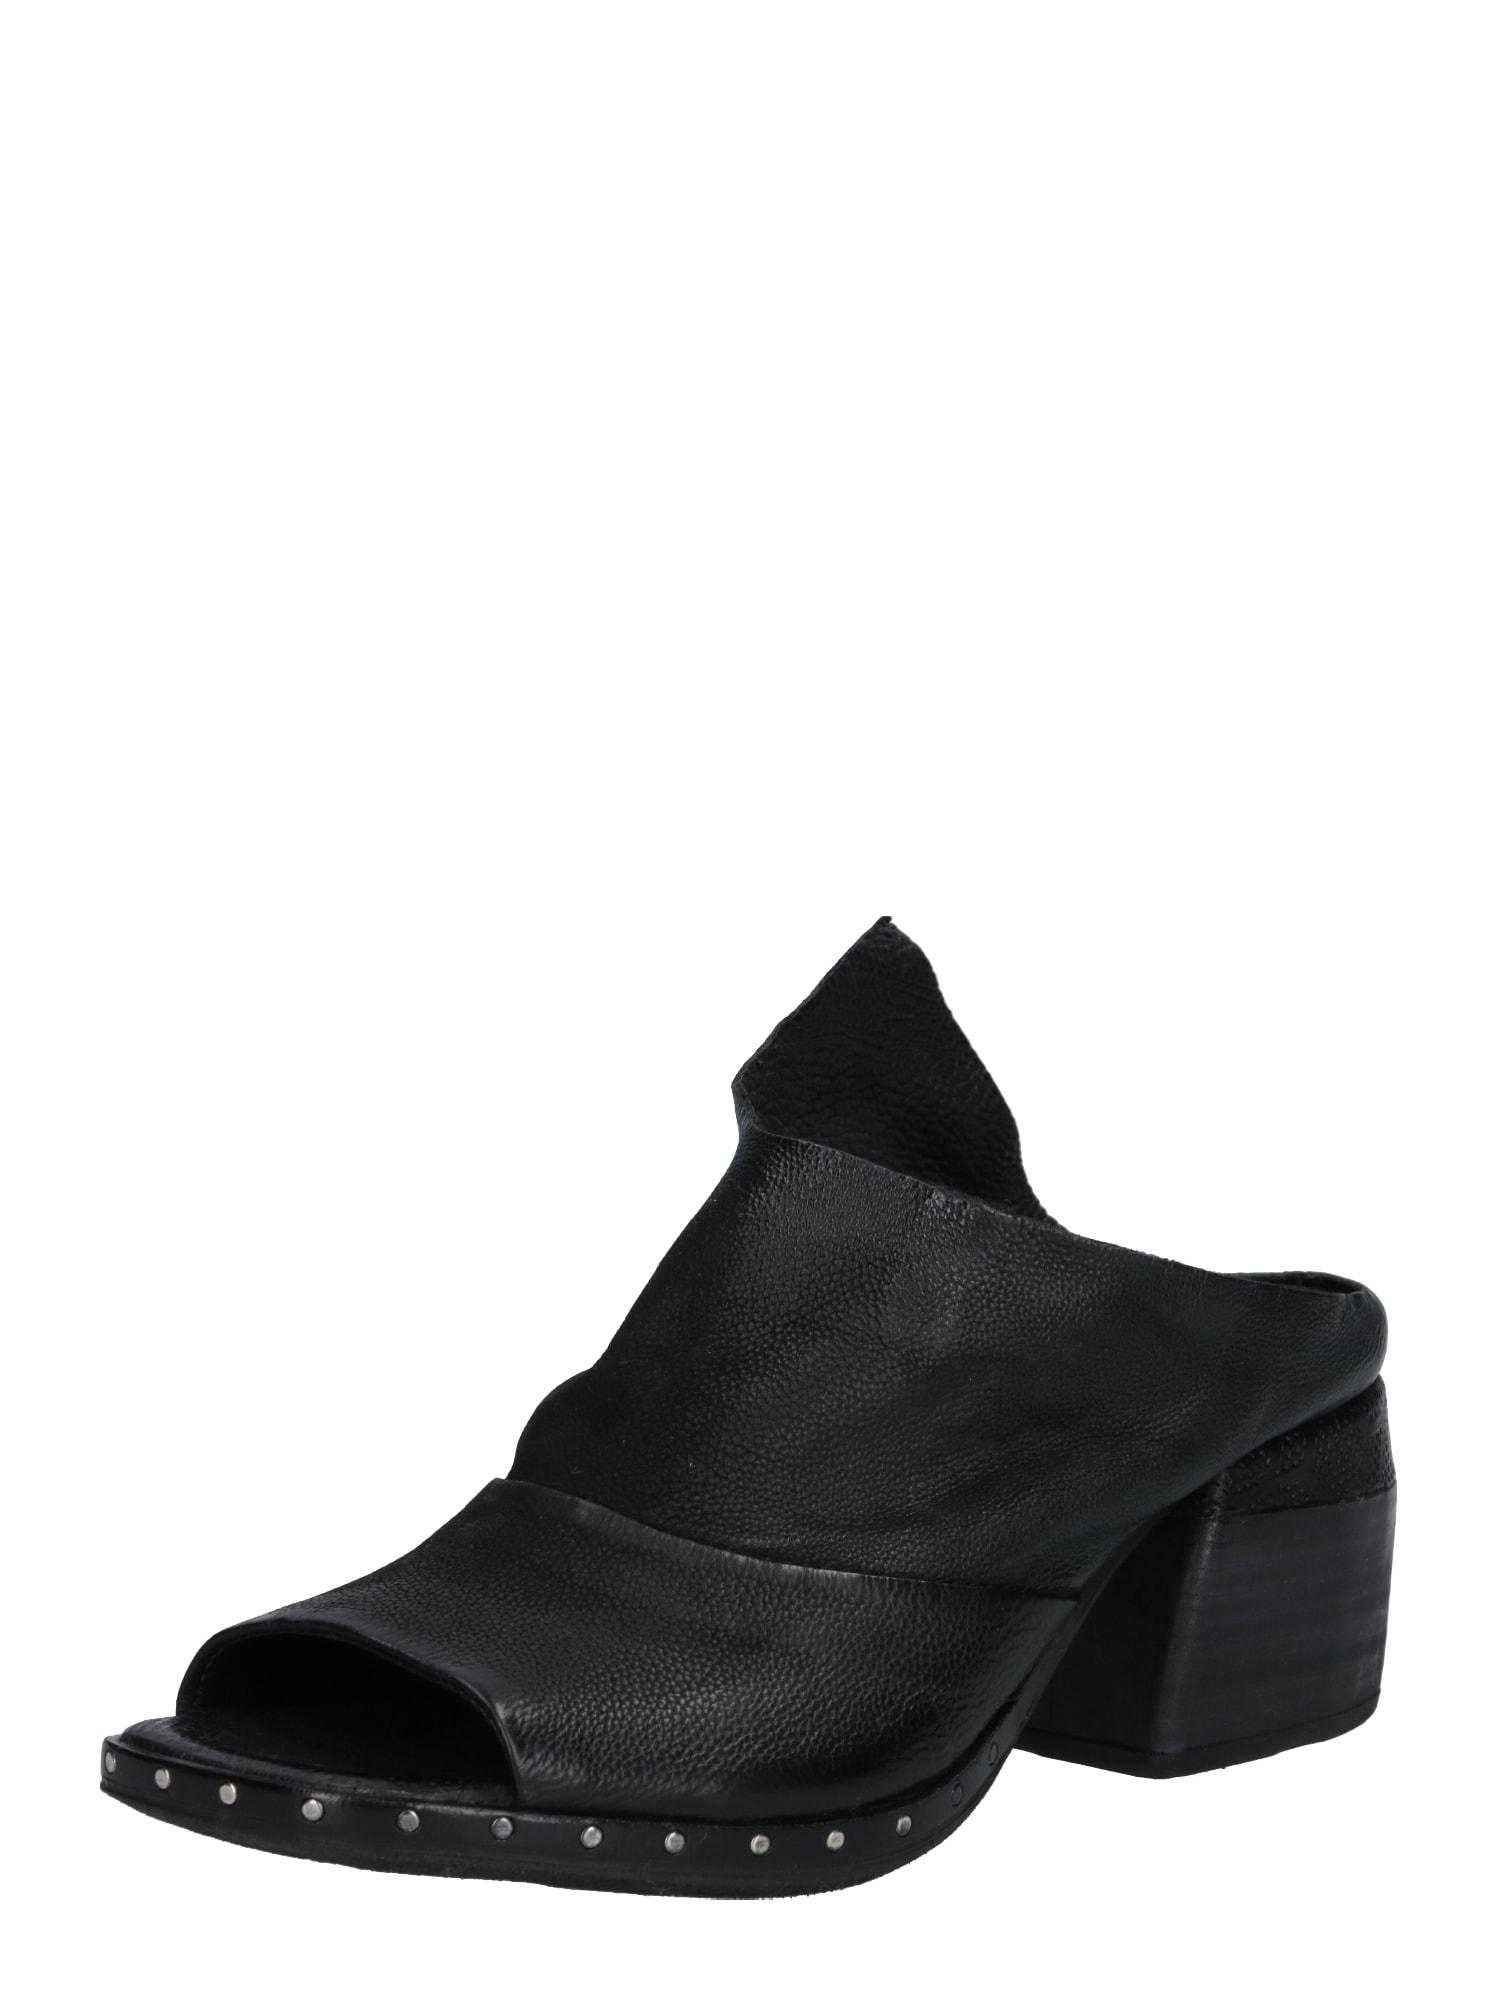 Pantofle ACAPULCO černá A.S.98